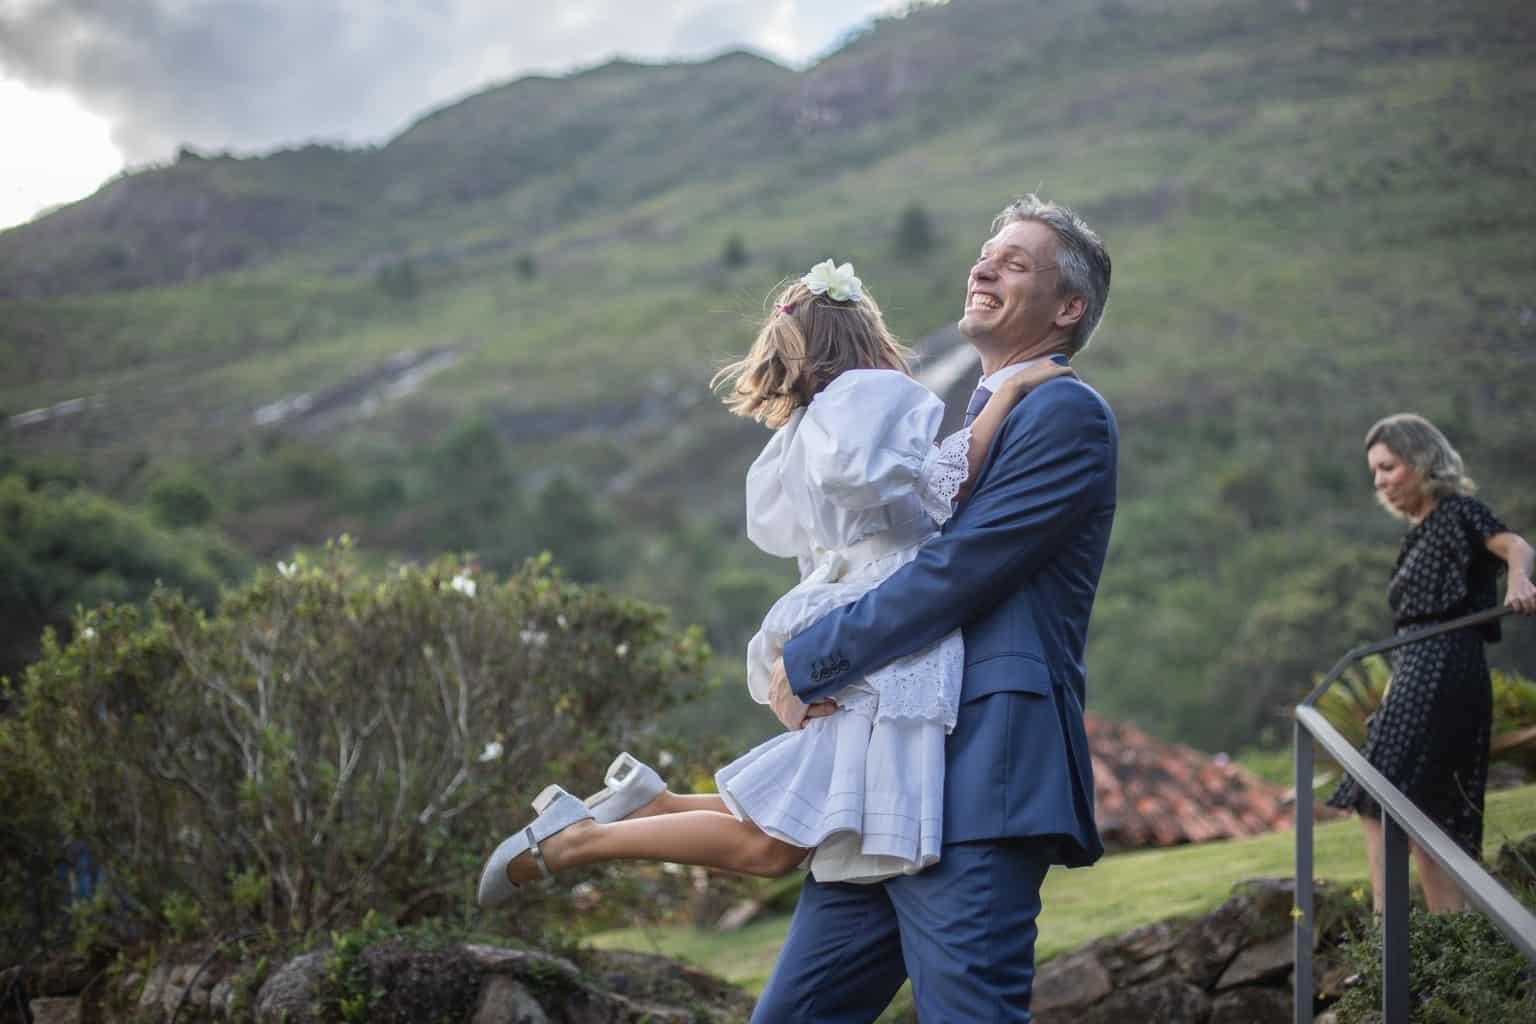 Casamento-Juliana-e-Sebastian-daminhas-Fotografia-Laura-Campanella-graviola-filmes-making-of-Pousada-La-Belle-Bruna63